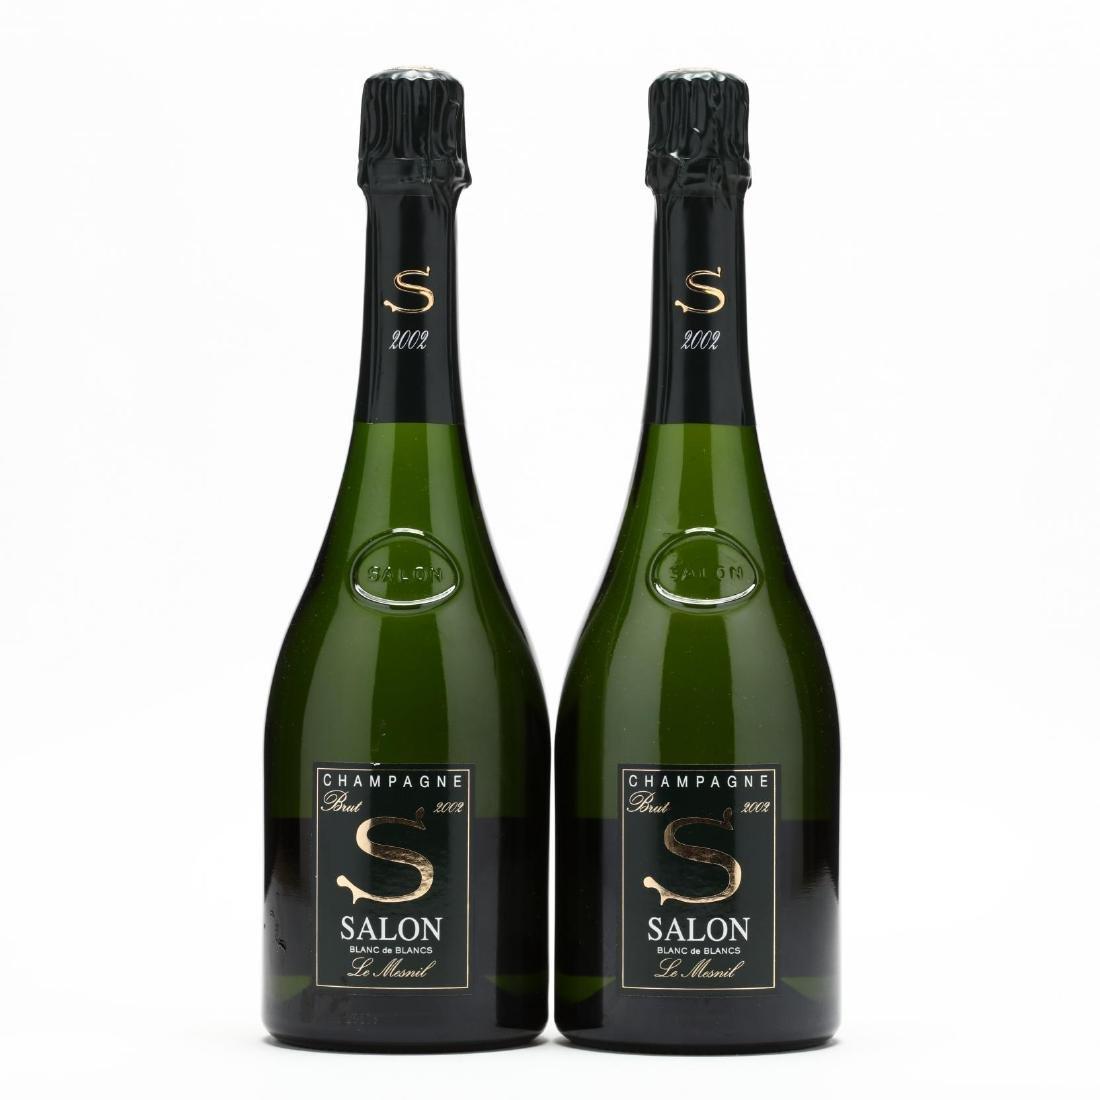 Salon Champagne - Vintage 2002